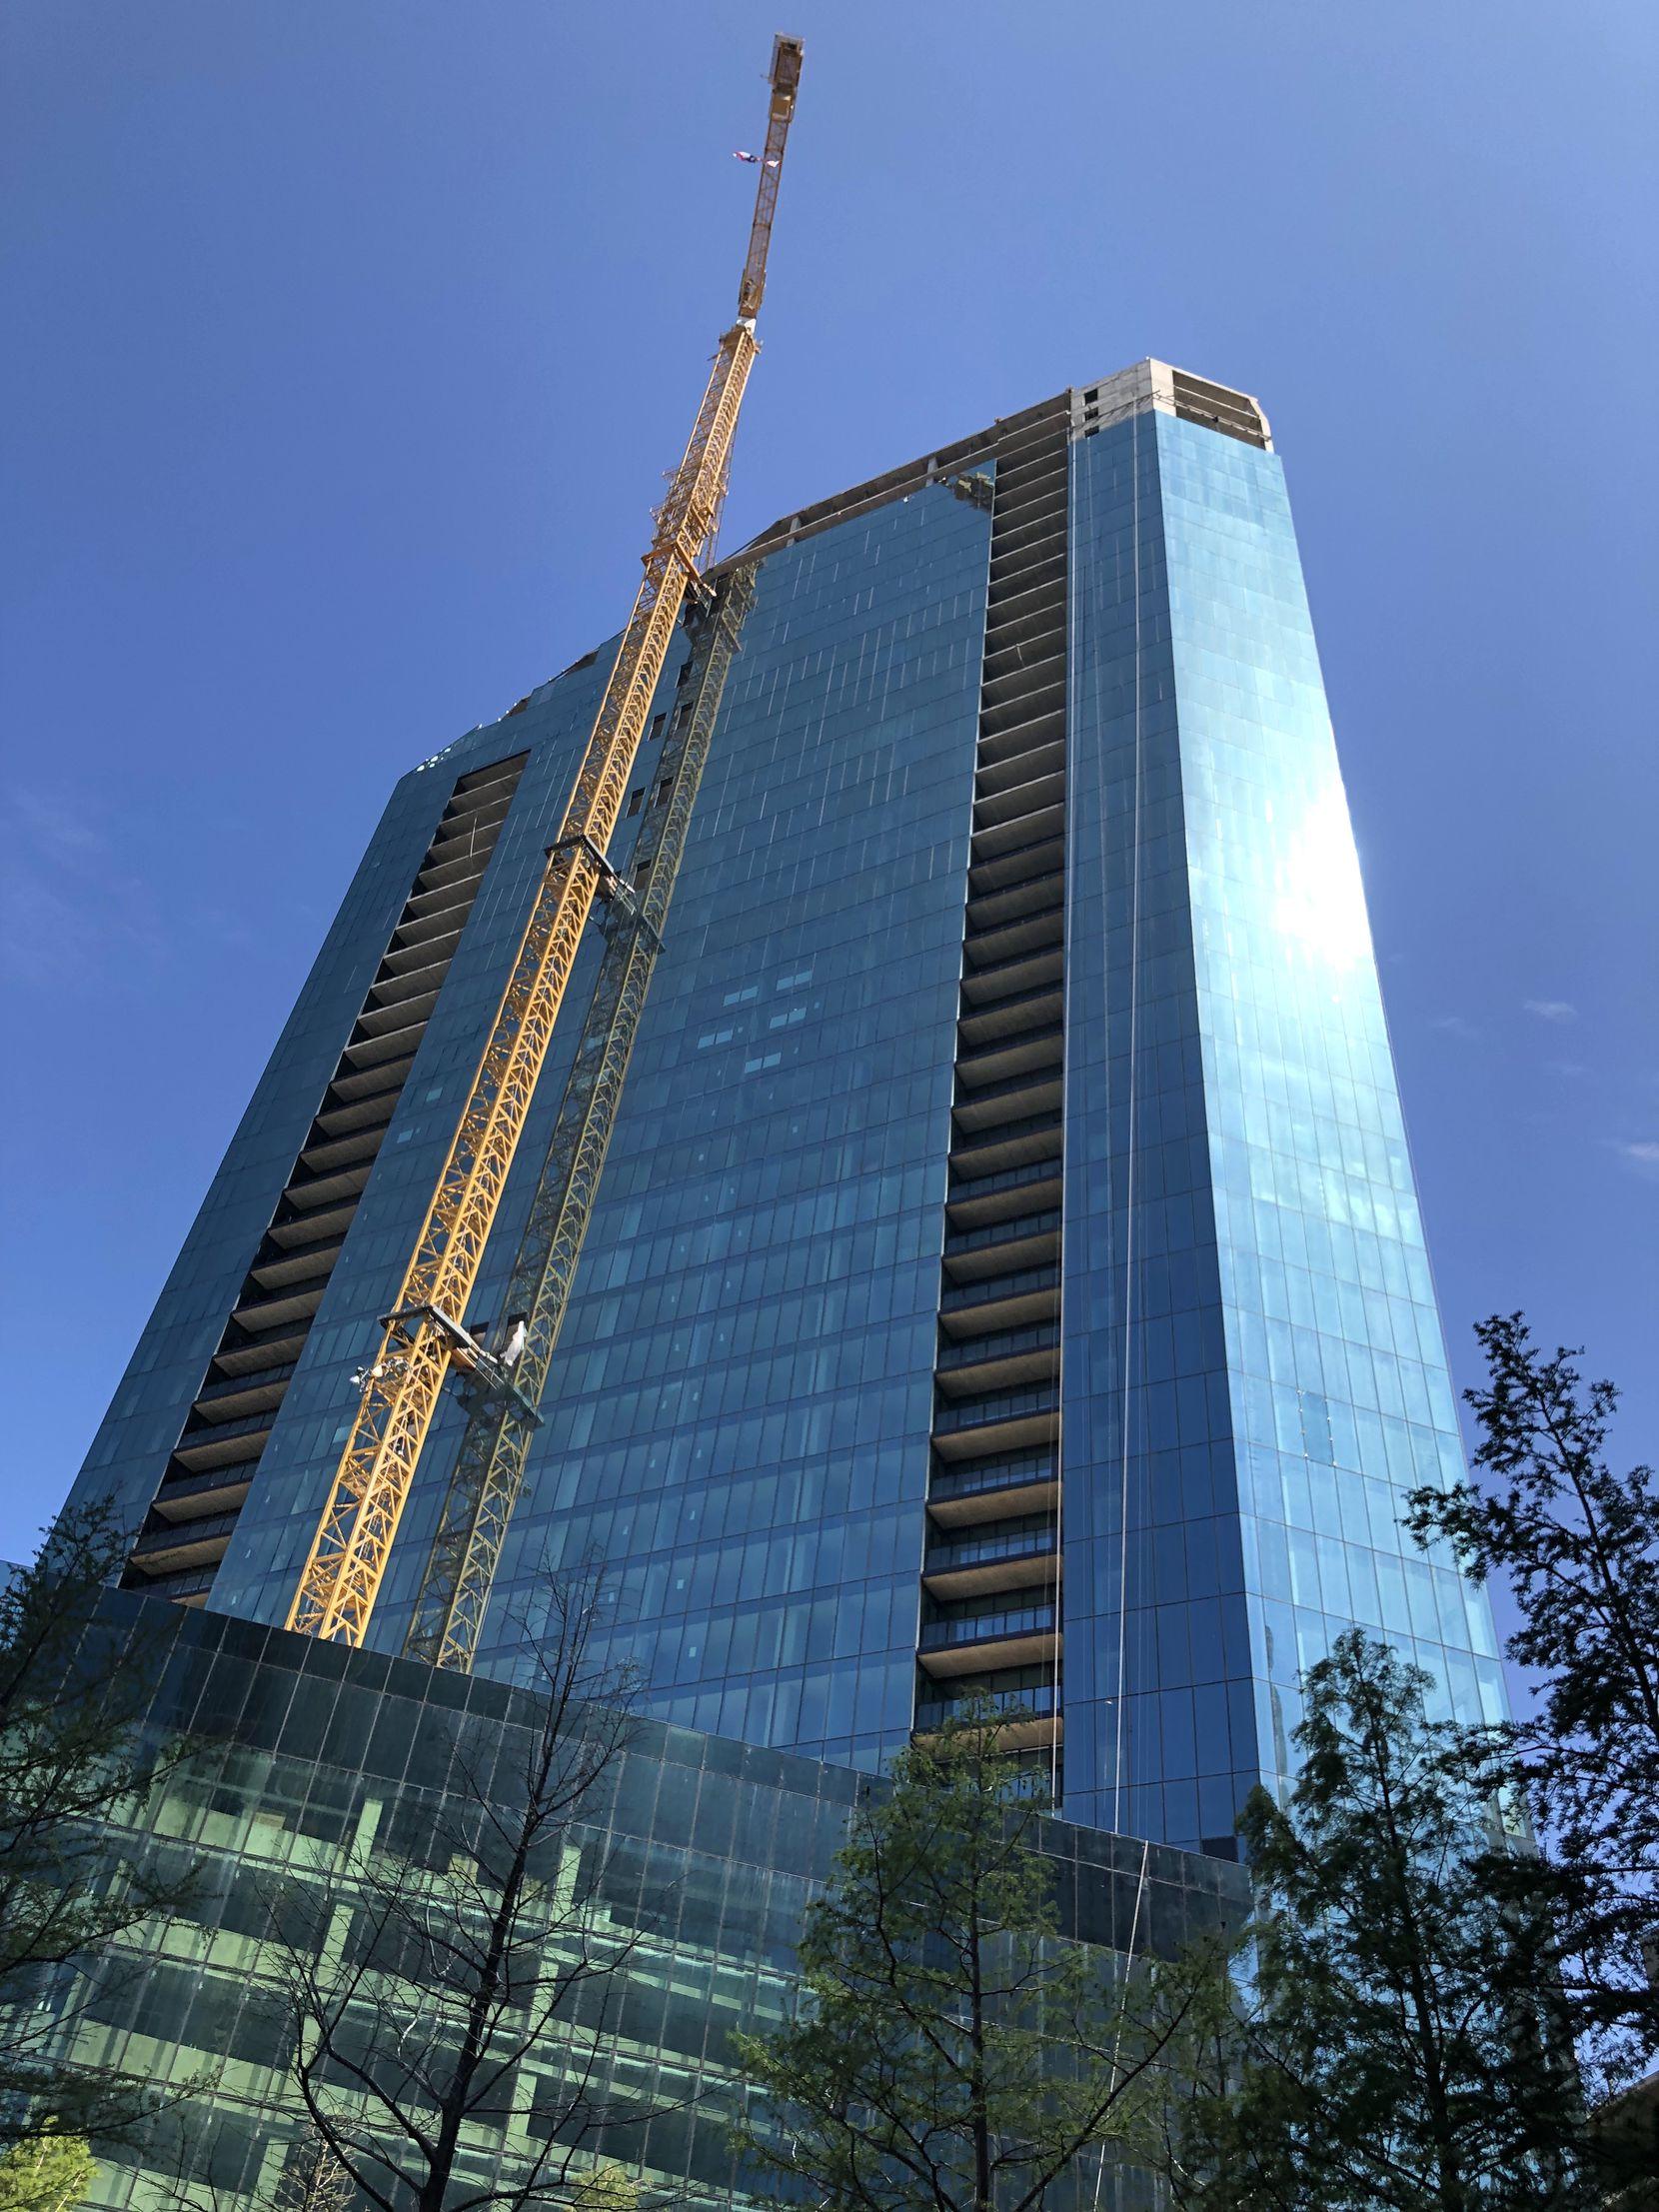 Downtown Dallas Tallest Skyscraper Construction Project